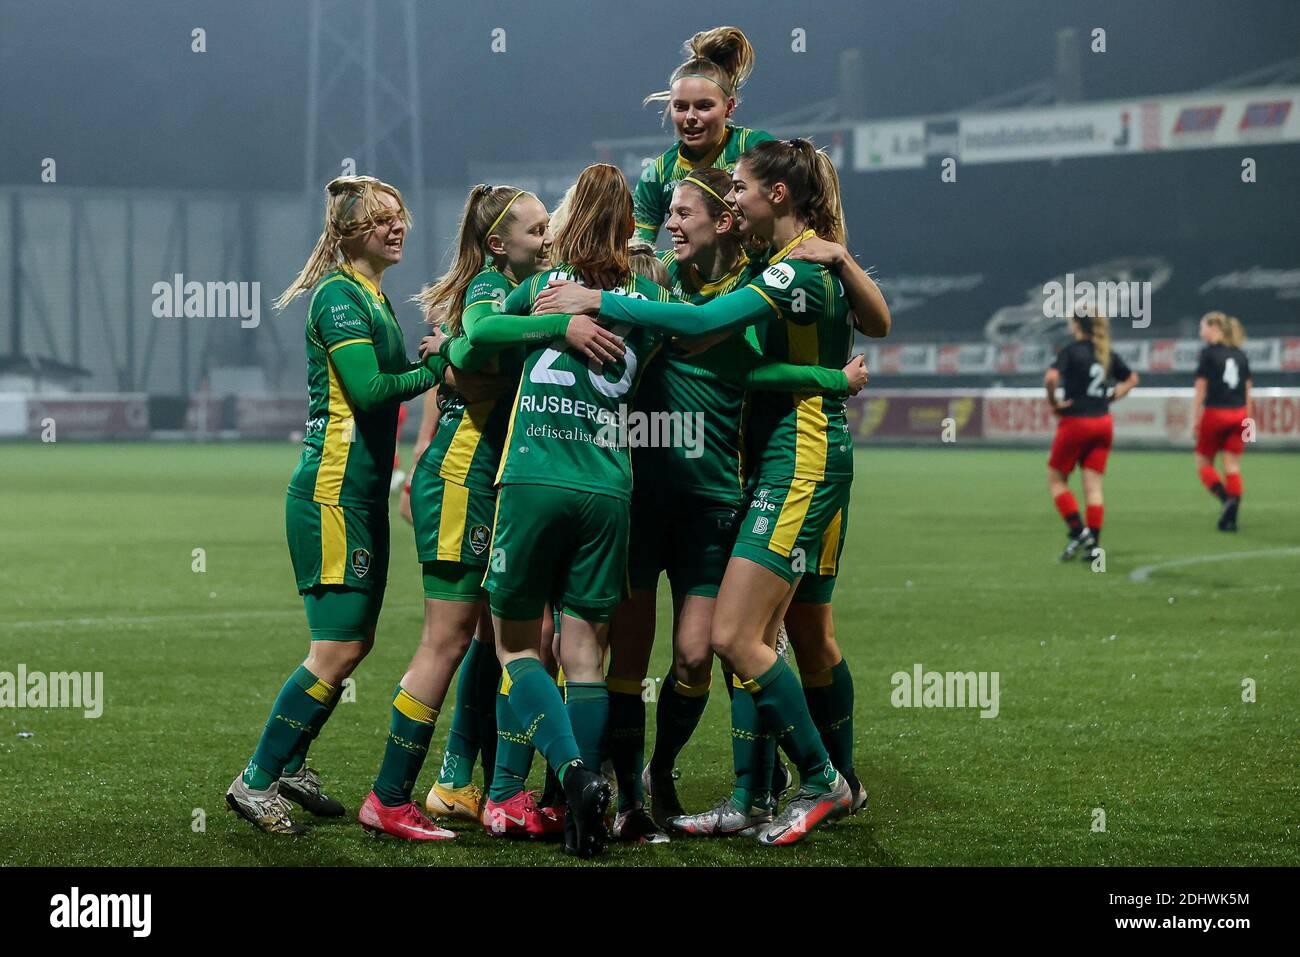 Rotterdam Netherlands December 11 Ado Den Haag Players Celebrates 0 1 During The Dutch Women Eredivisie Match Between Excelsior And Ado Den Haag A Stock Photo Alamy